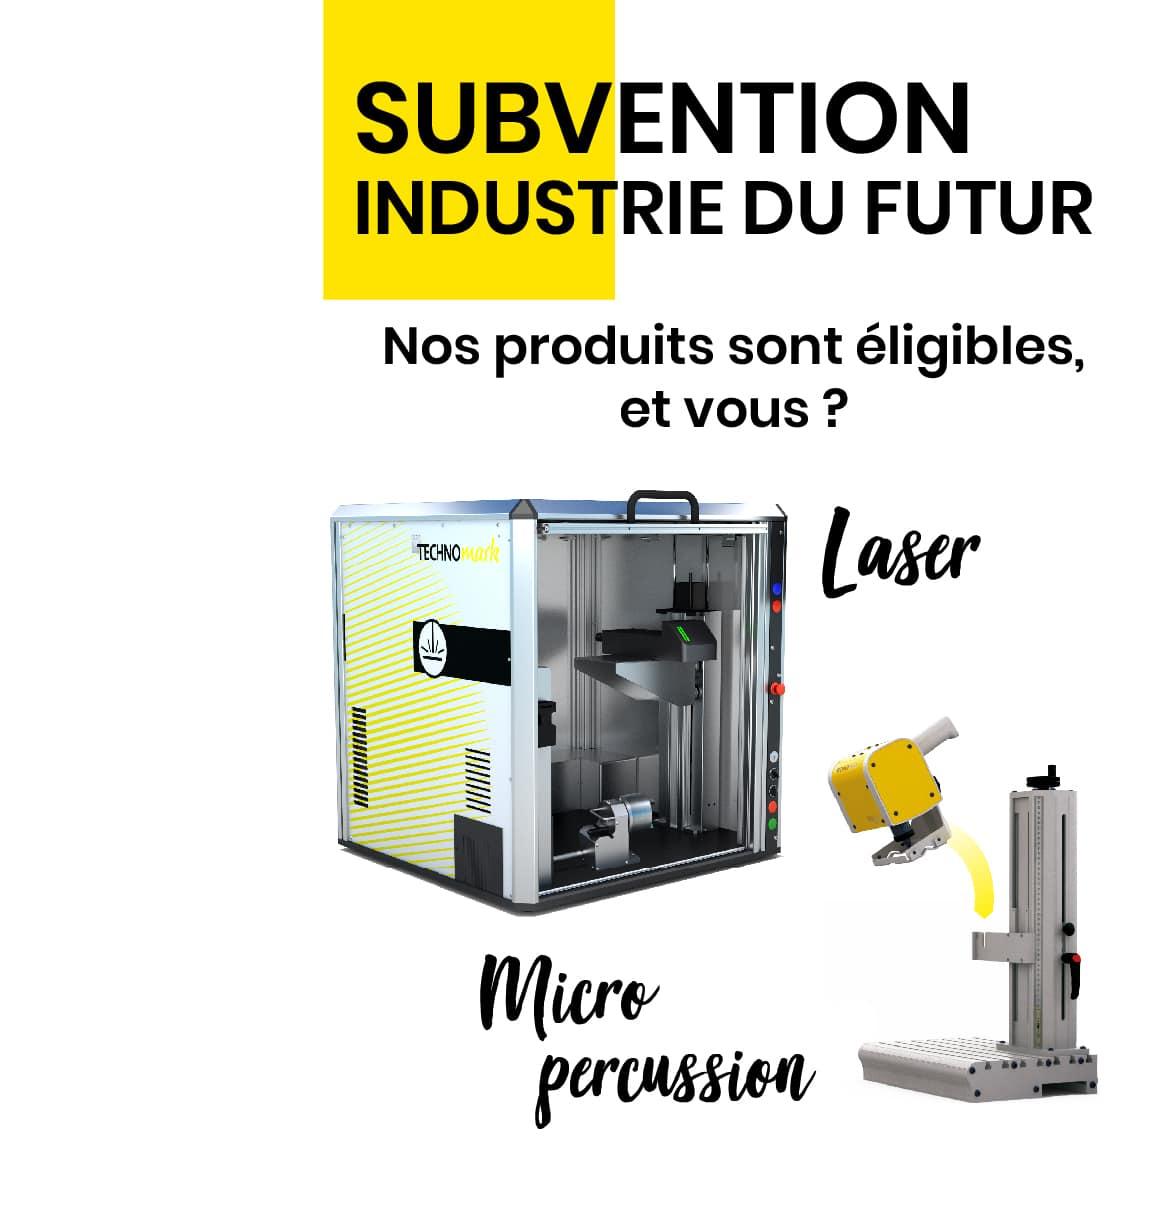 Subvention industrie du futur technomark